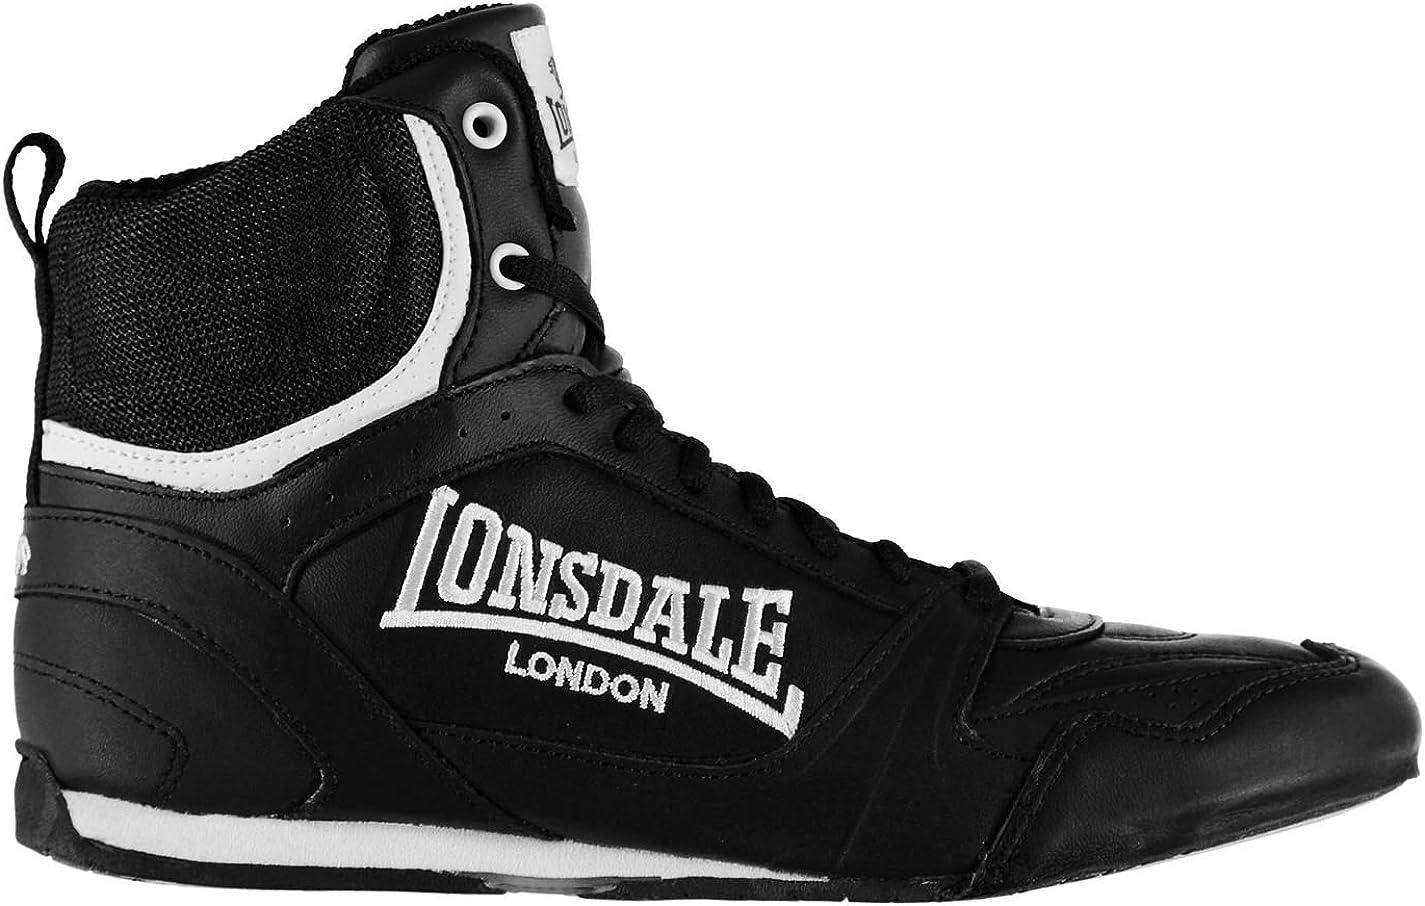 Lonsdale Herren Contender Boxschuhe Boxen Stiefel Sport Turnschuhe Schuhe